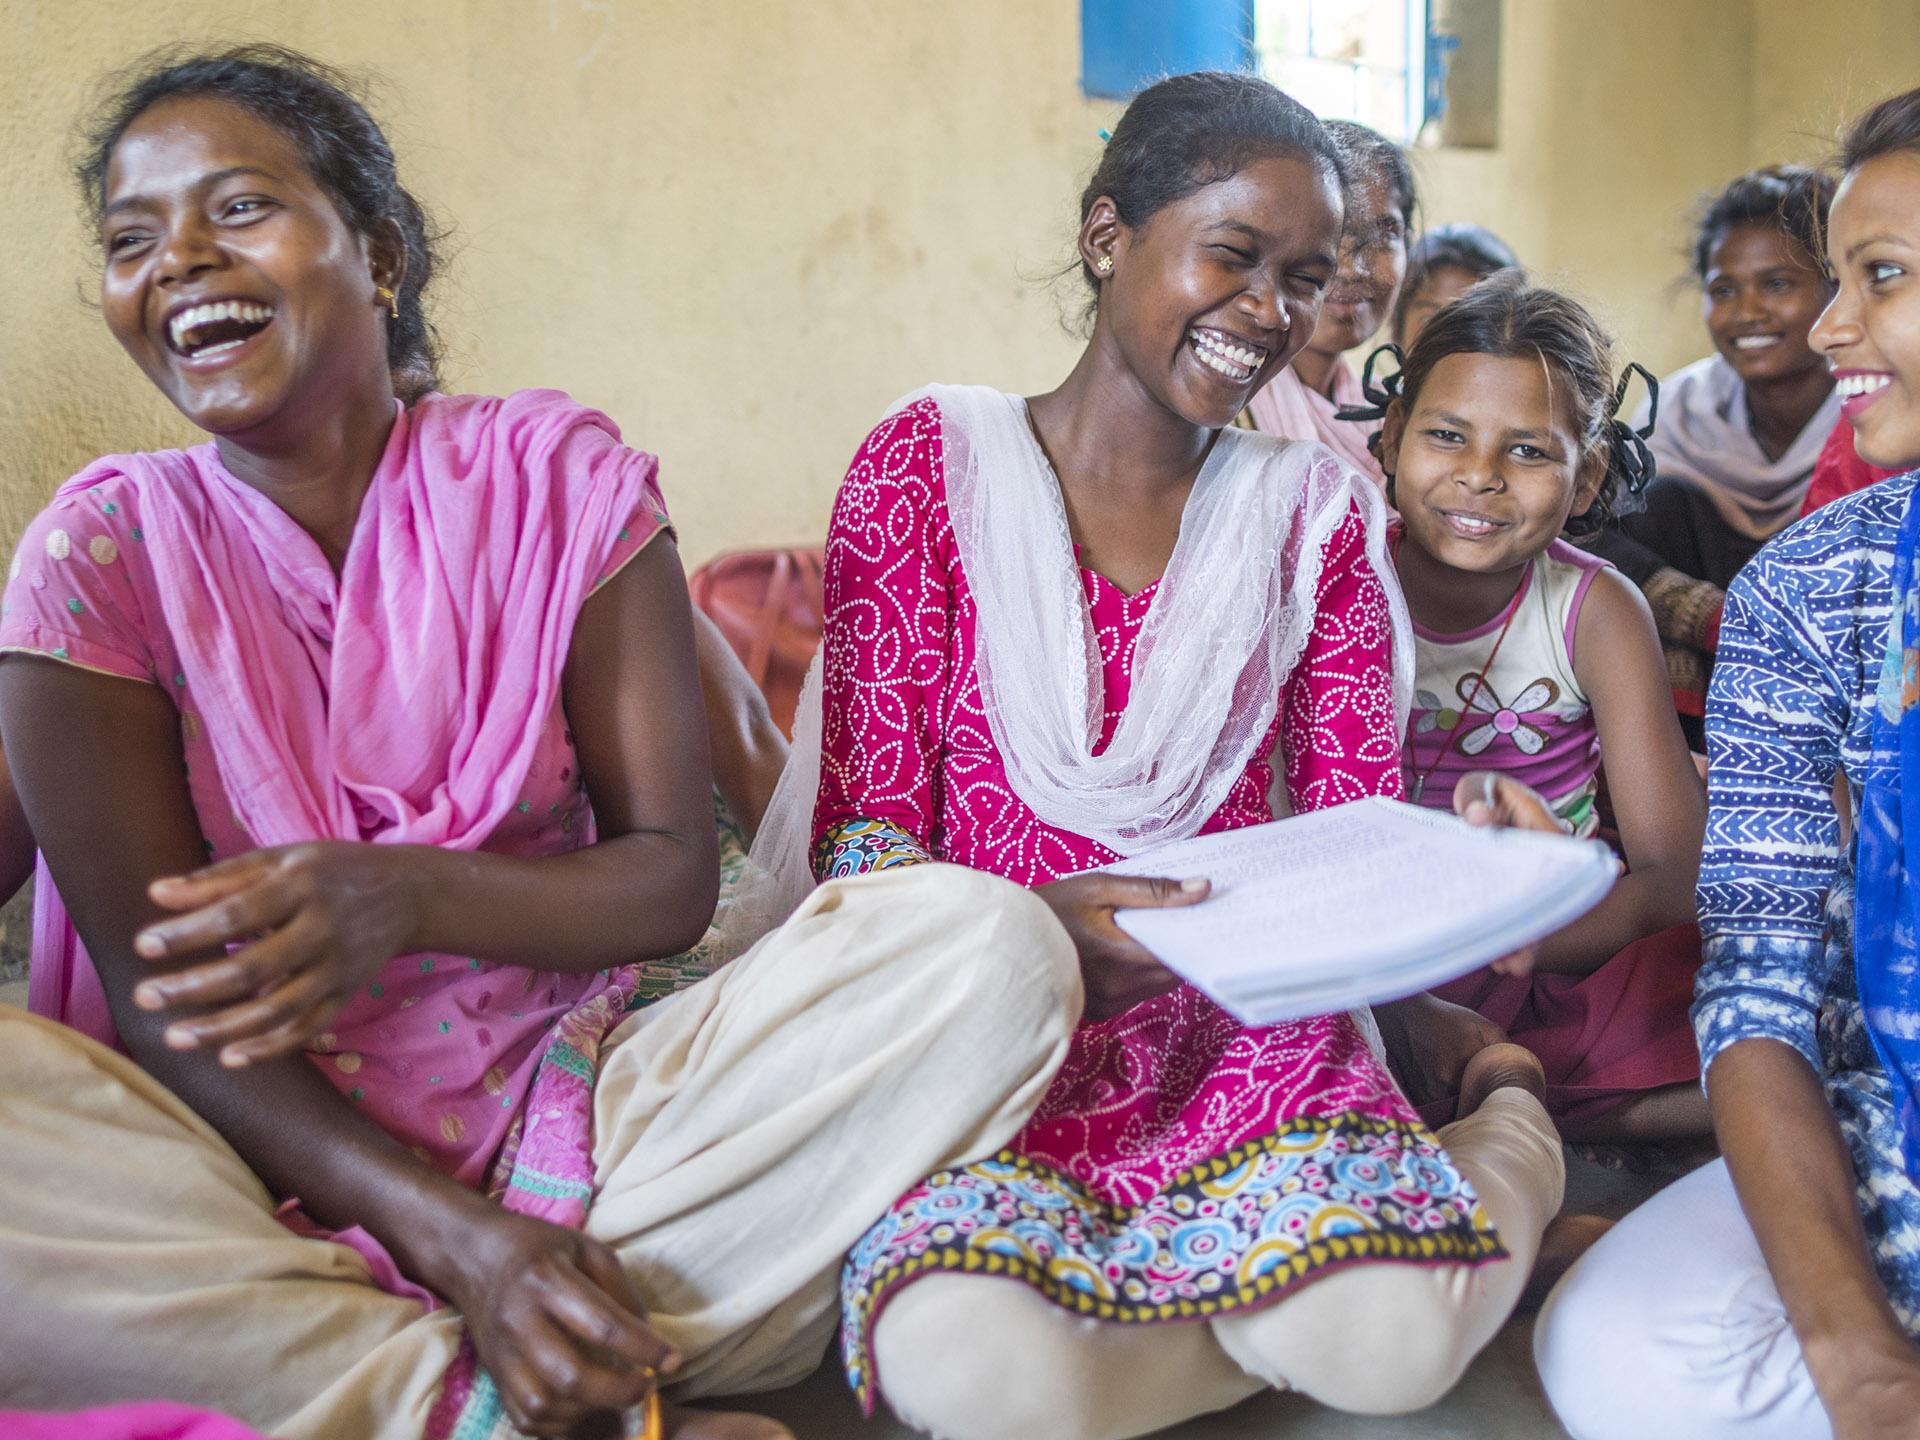 Innovation in menstrual hygiene management